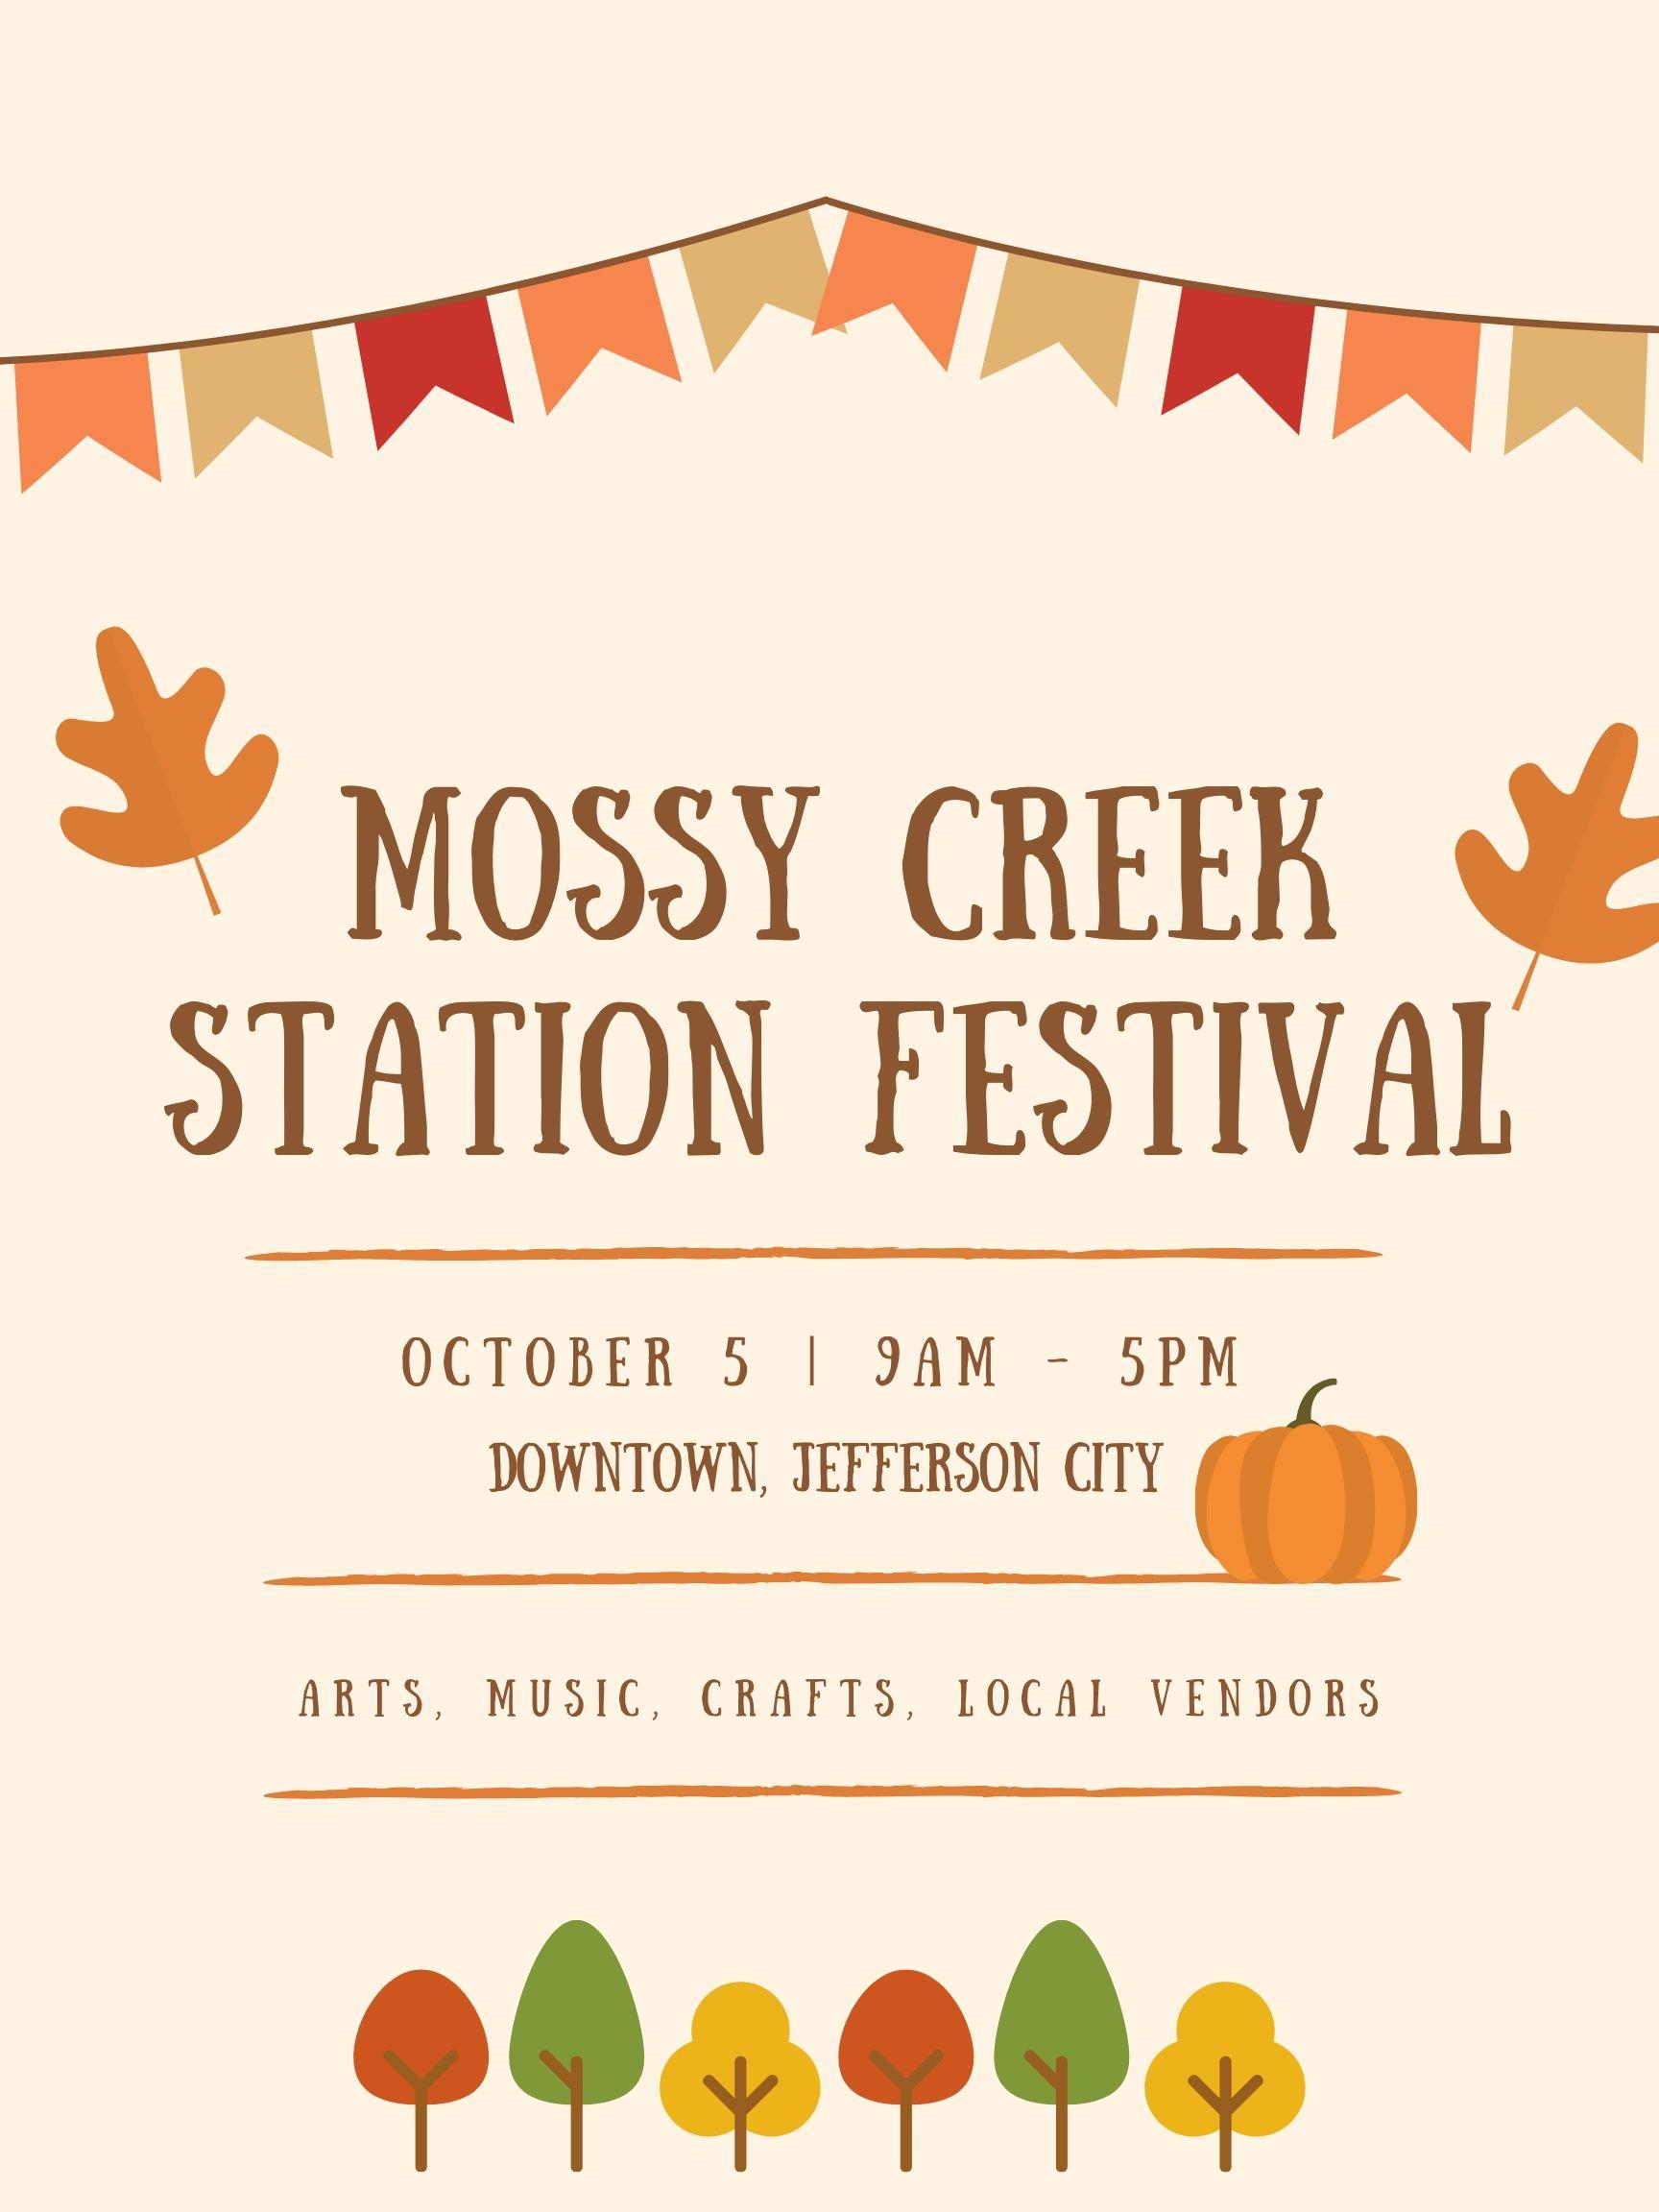 Mossy Creek Station Festival.jpg